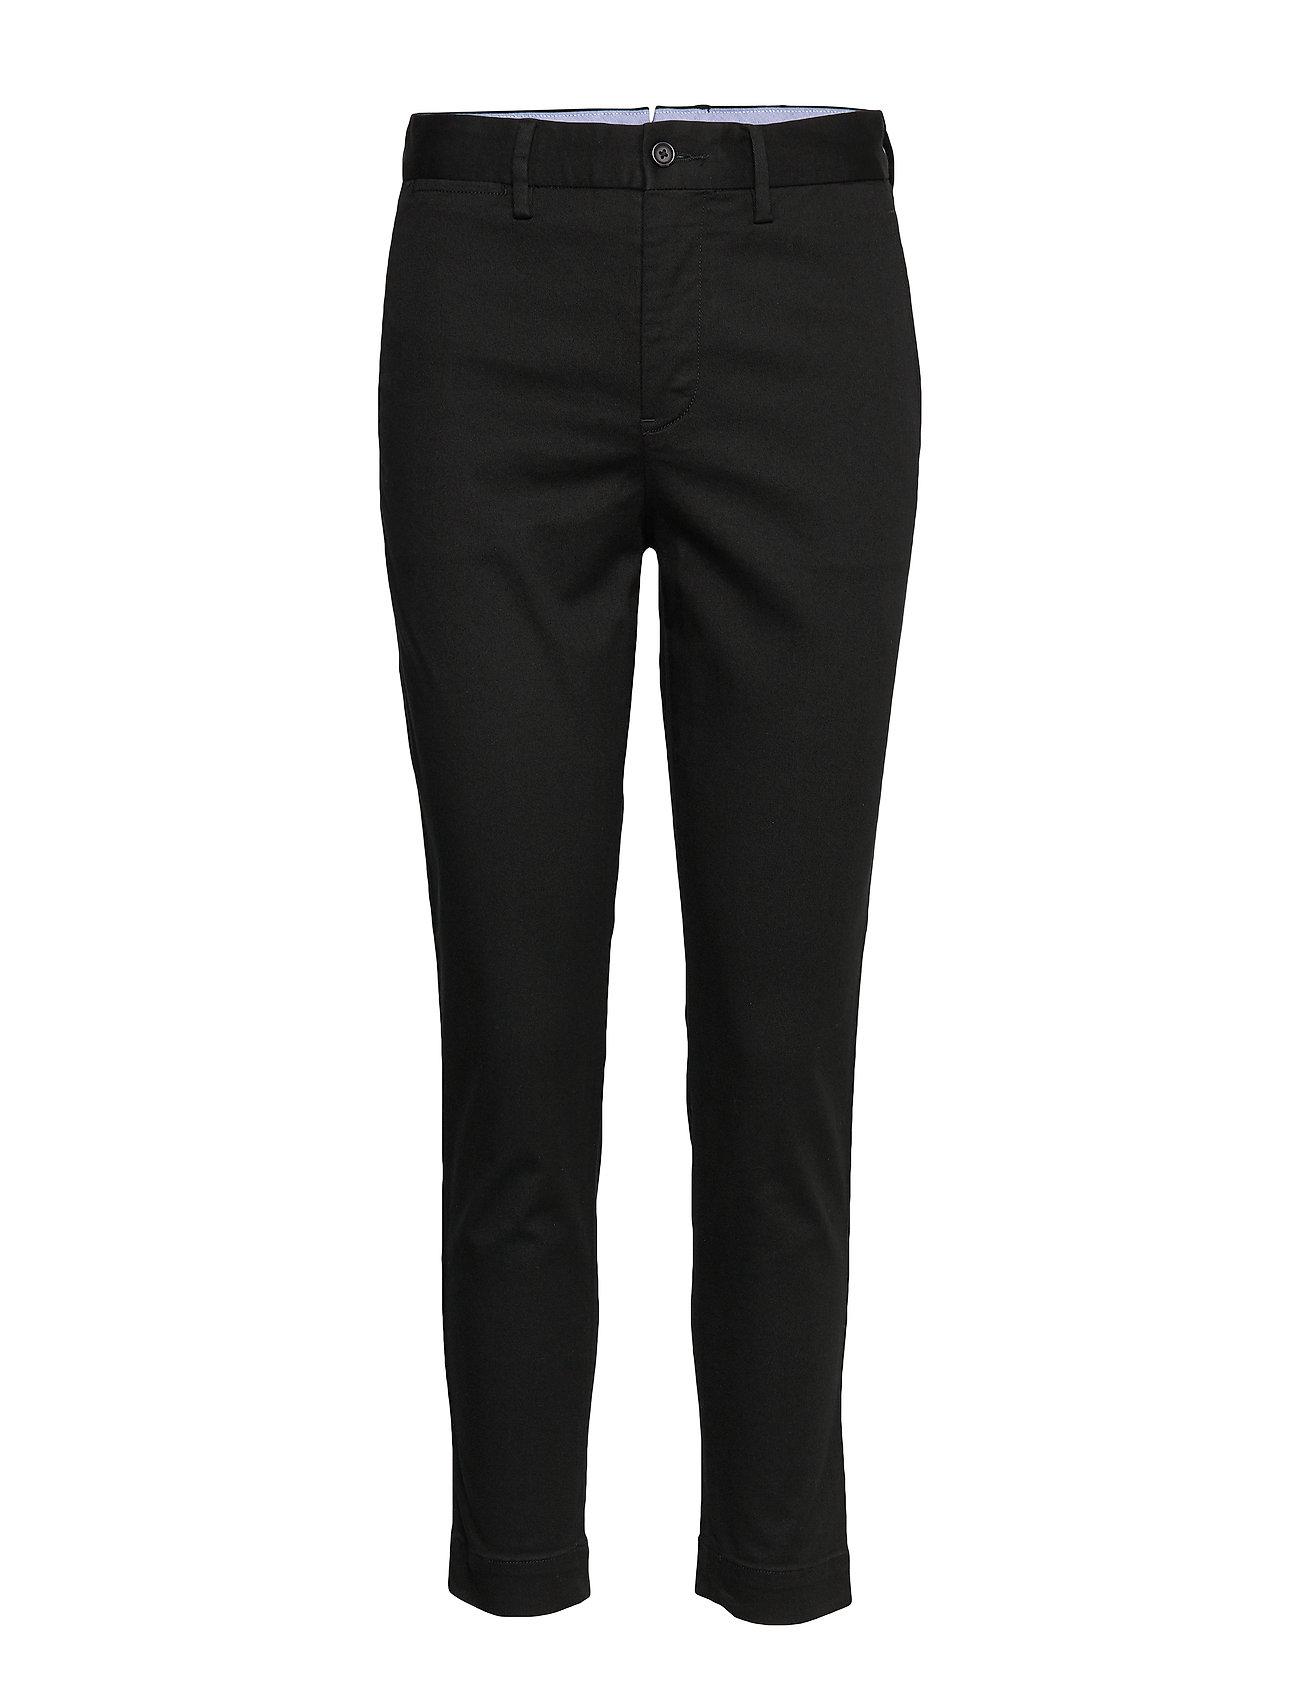 Polo Ralph Lauren Stretch Chino Pant - POLO BLACK